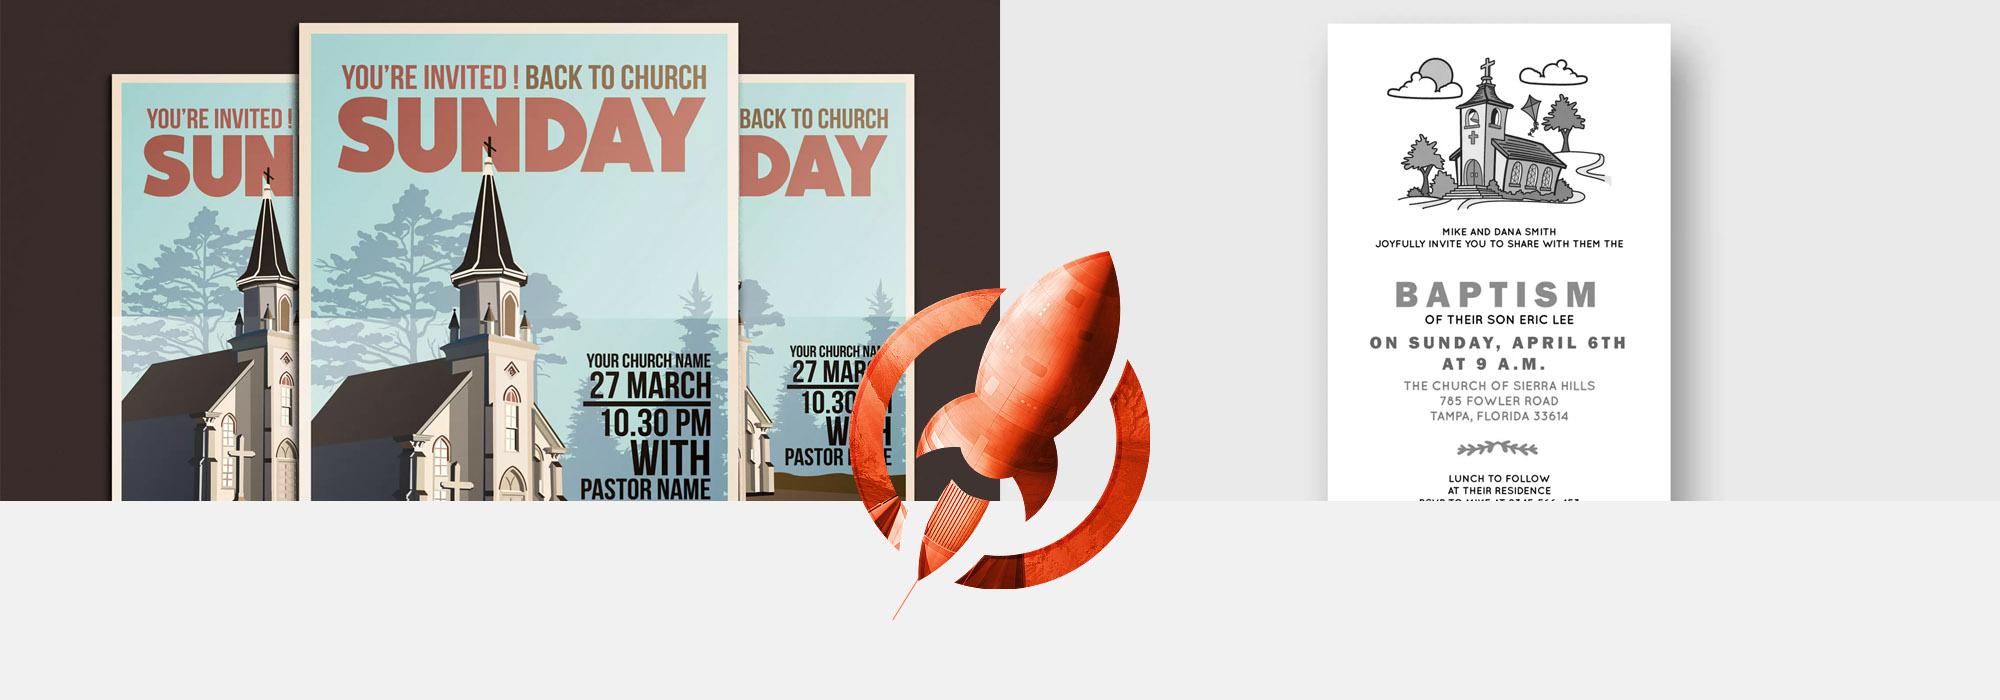 Church Printing Services | Rush Flyer Printing | Same Day Printing